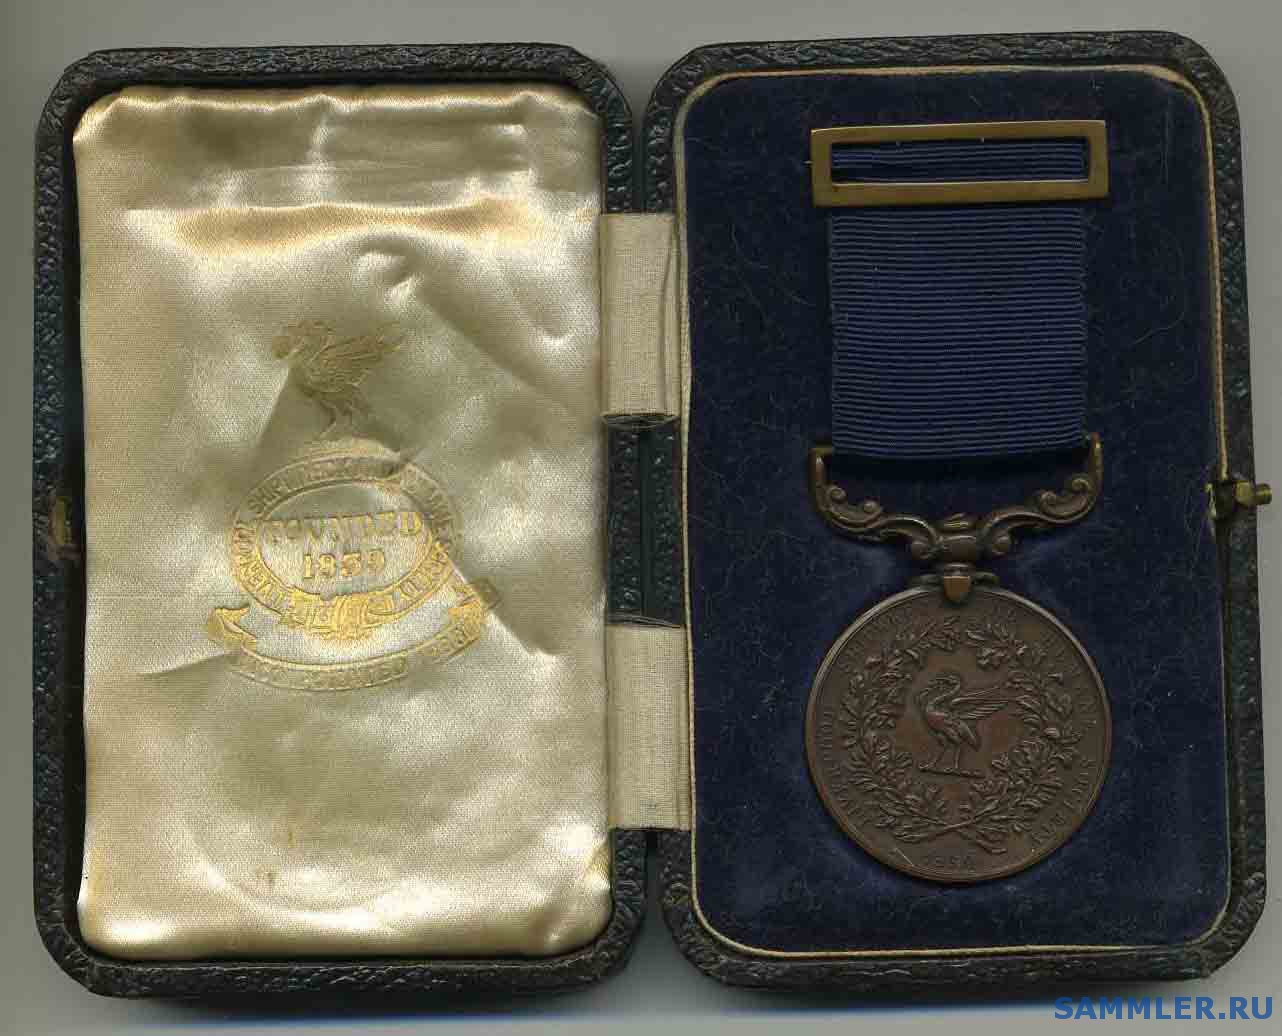 Liverpool_Shipwreck___Humane_Society_Marine_Medal_.jpg